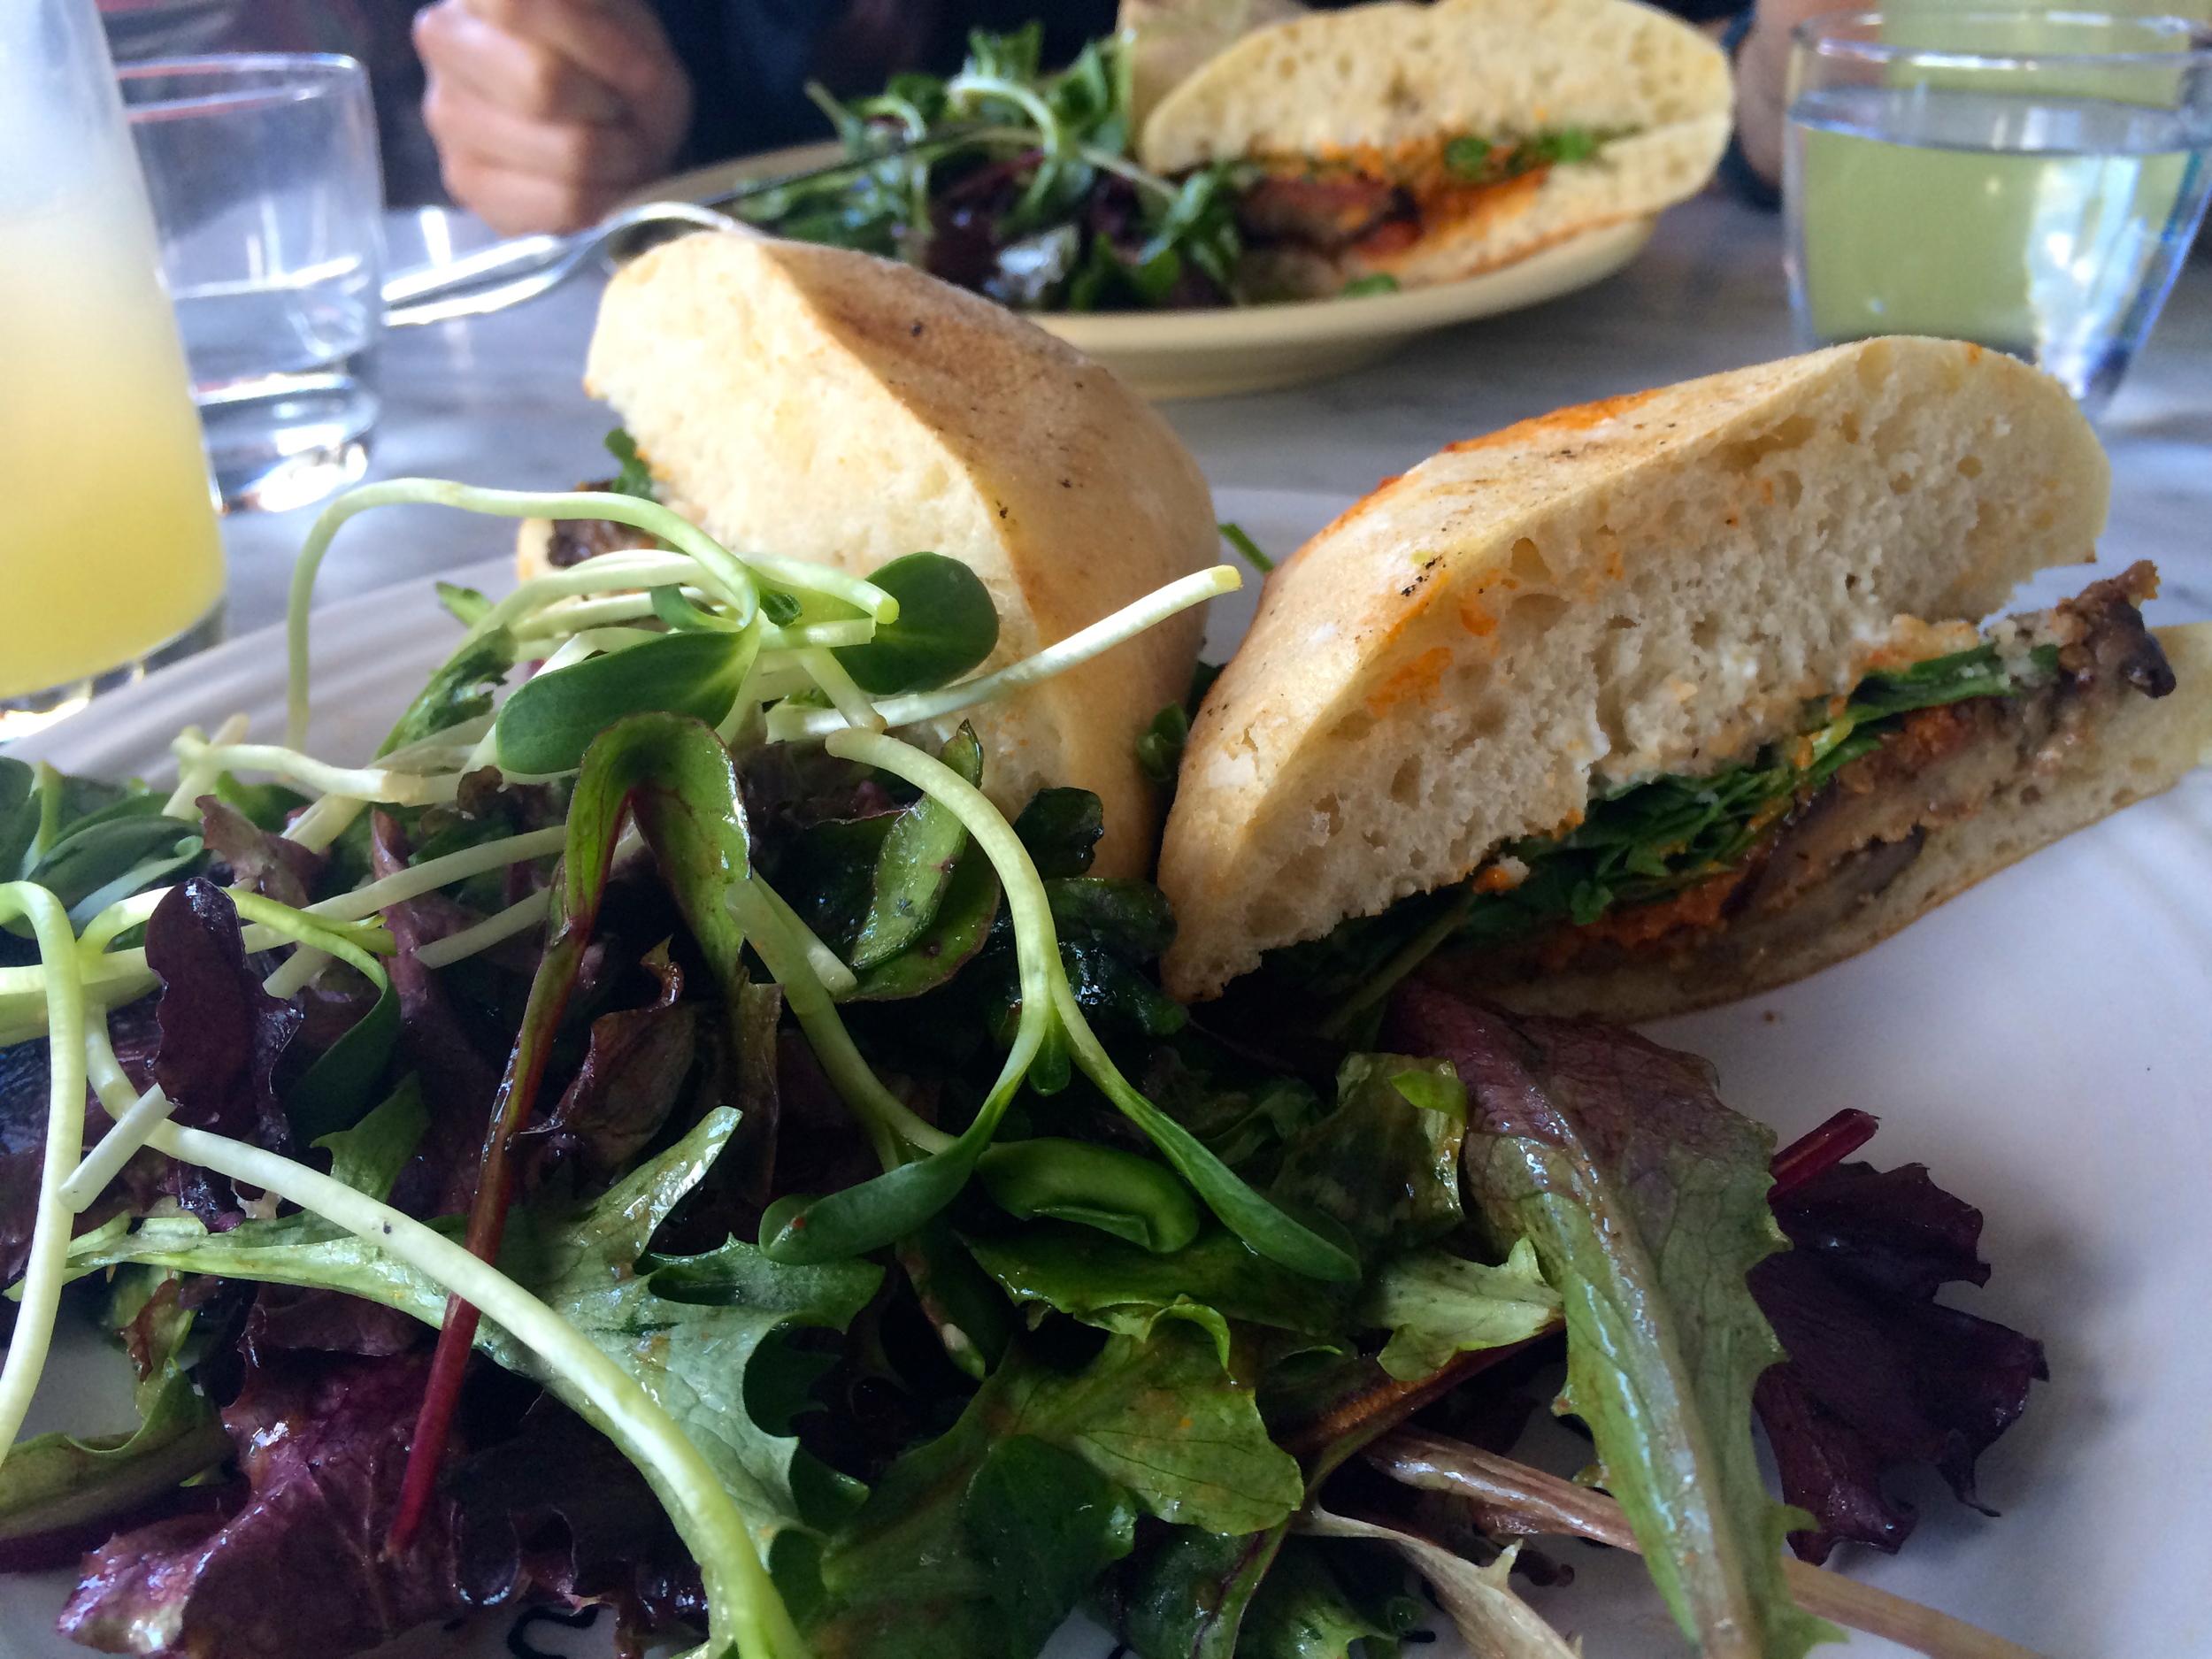 Cafe Gratitude - AWESOME Eggplant Parmesan.